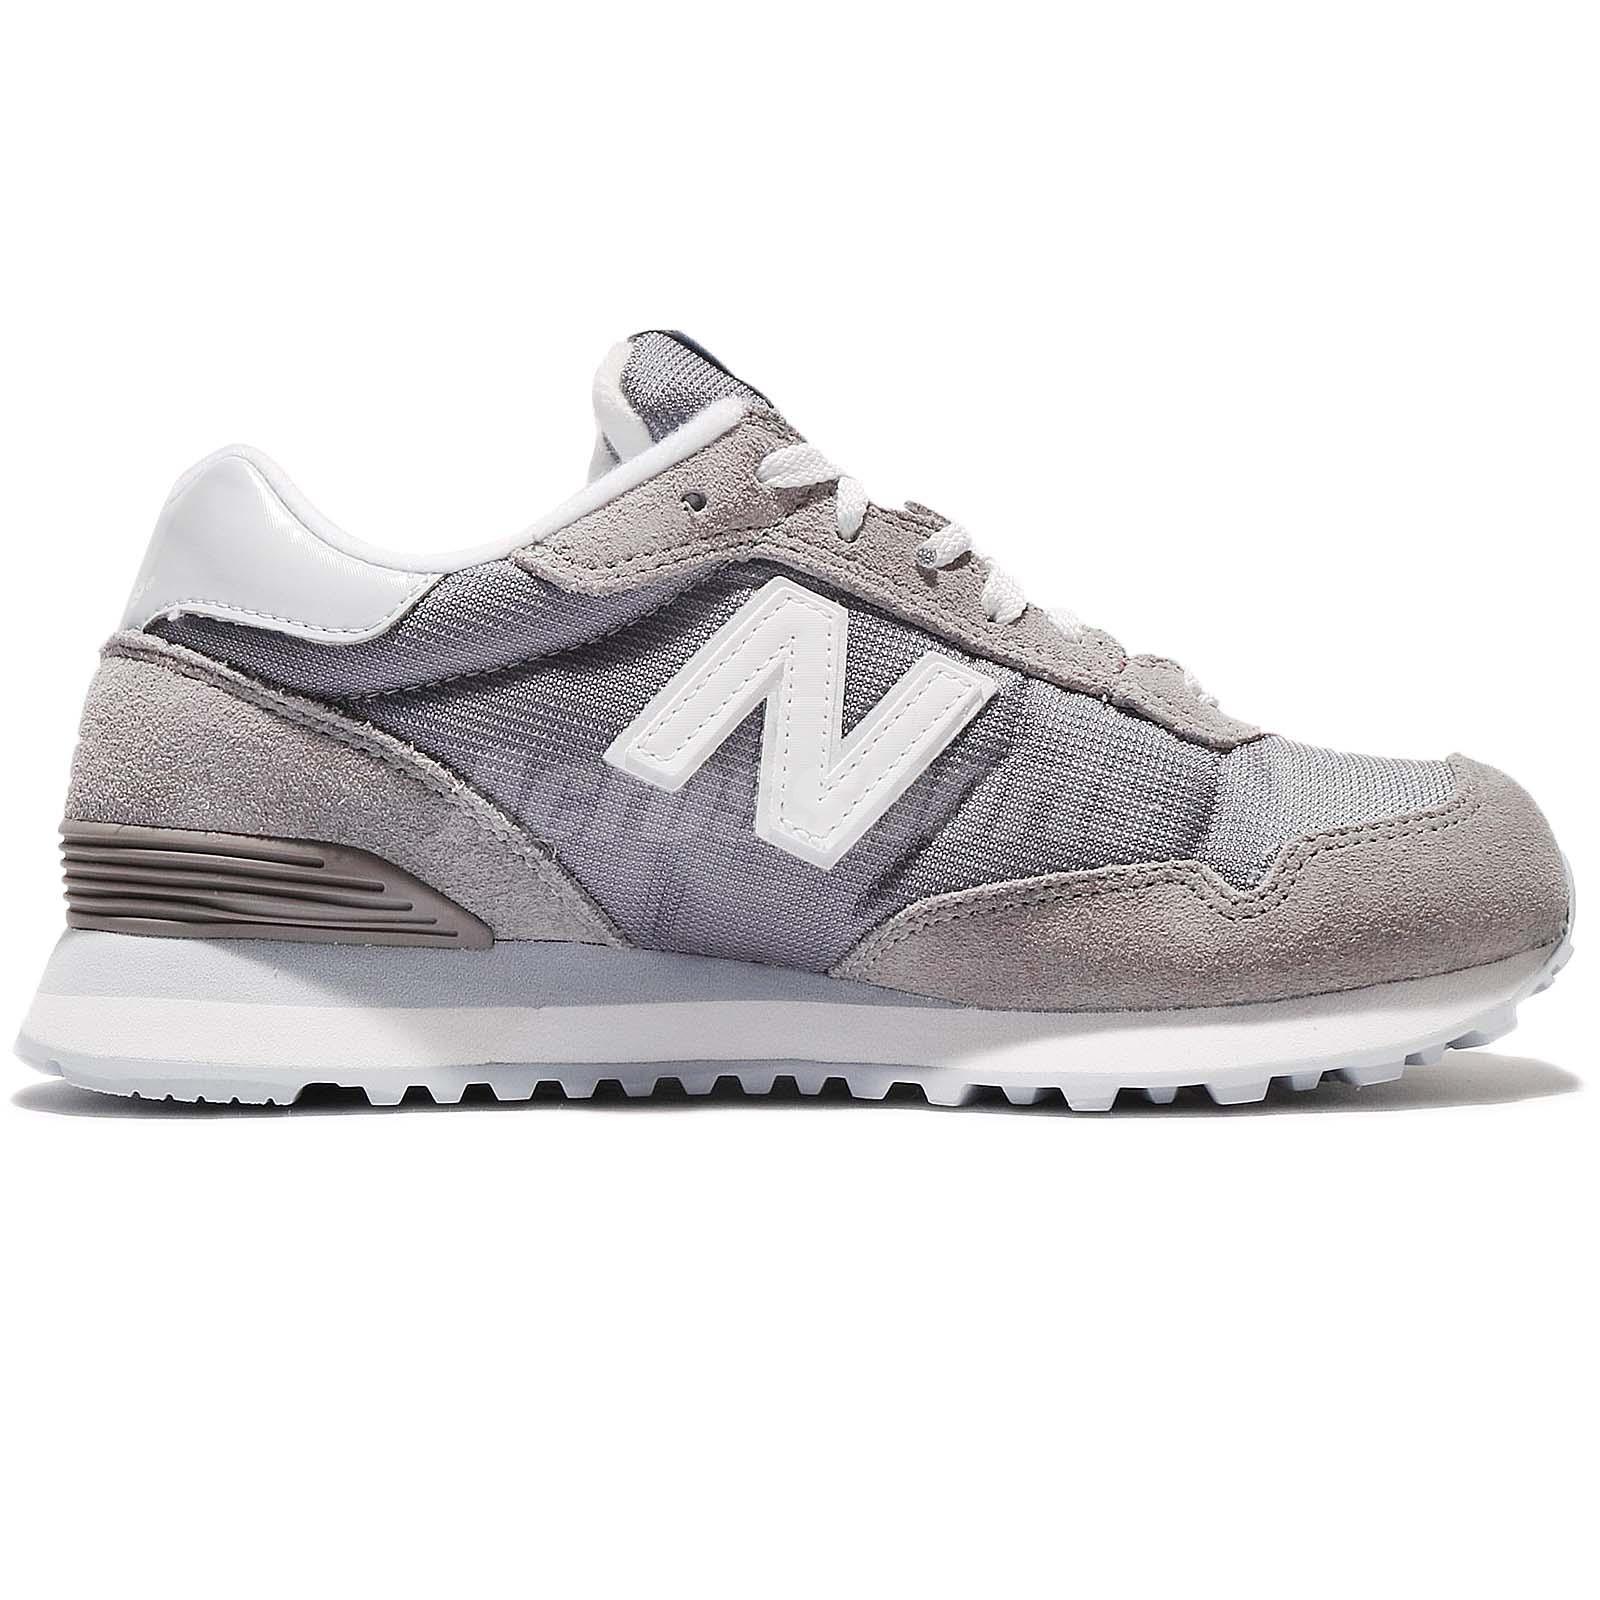 New Balance WL515IFC B Suede Grey White Women Running Shoes Sneakers ... 3cfd96ac547aa